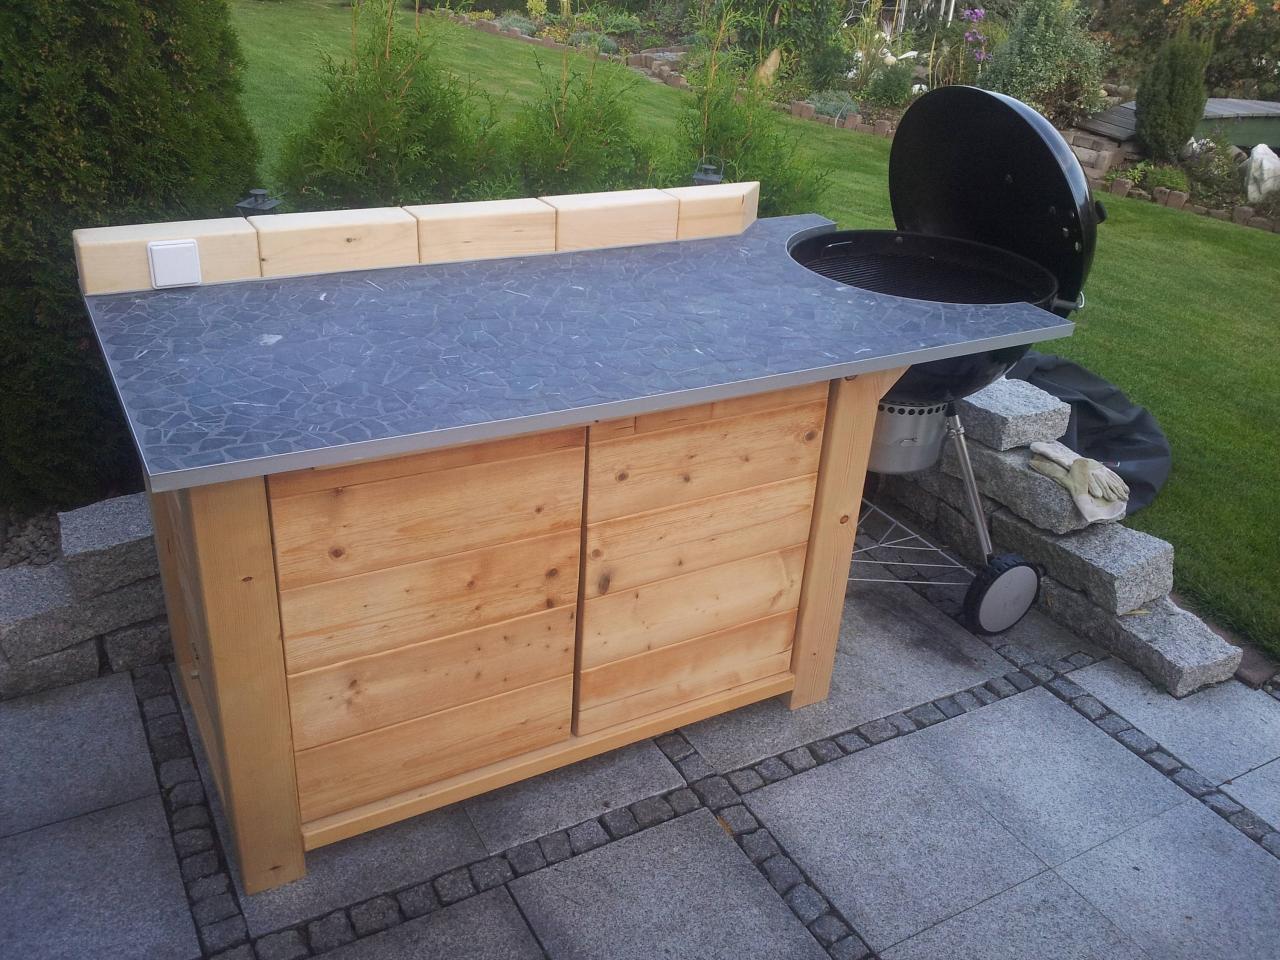 grill - / gartenküche - bauanleitung zum selberbauen - 1-2-do